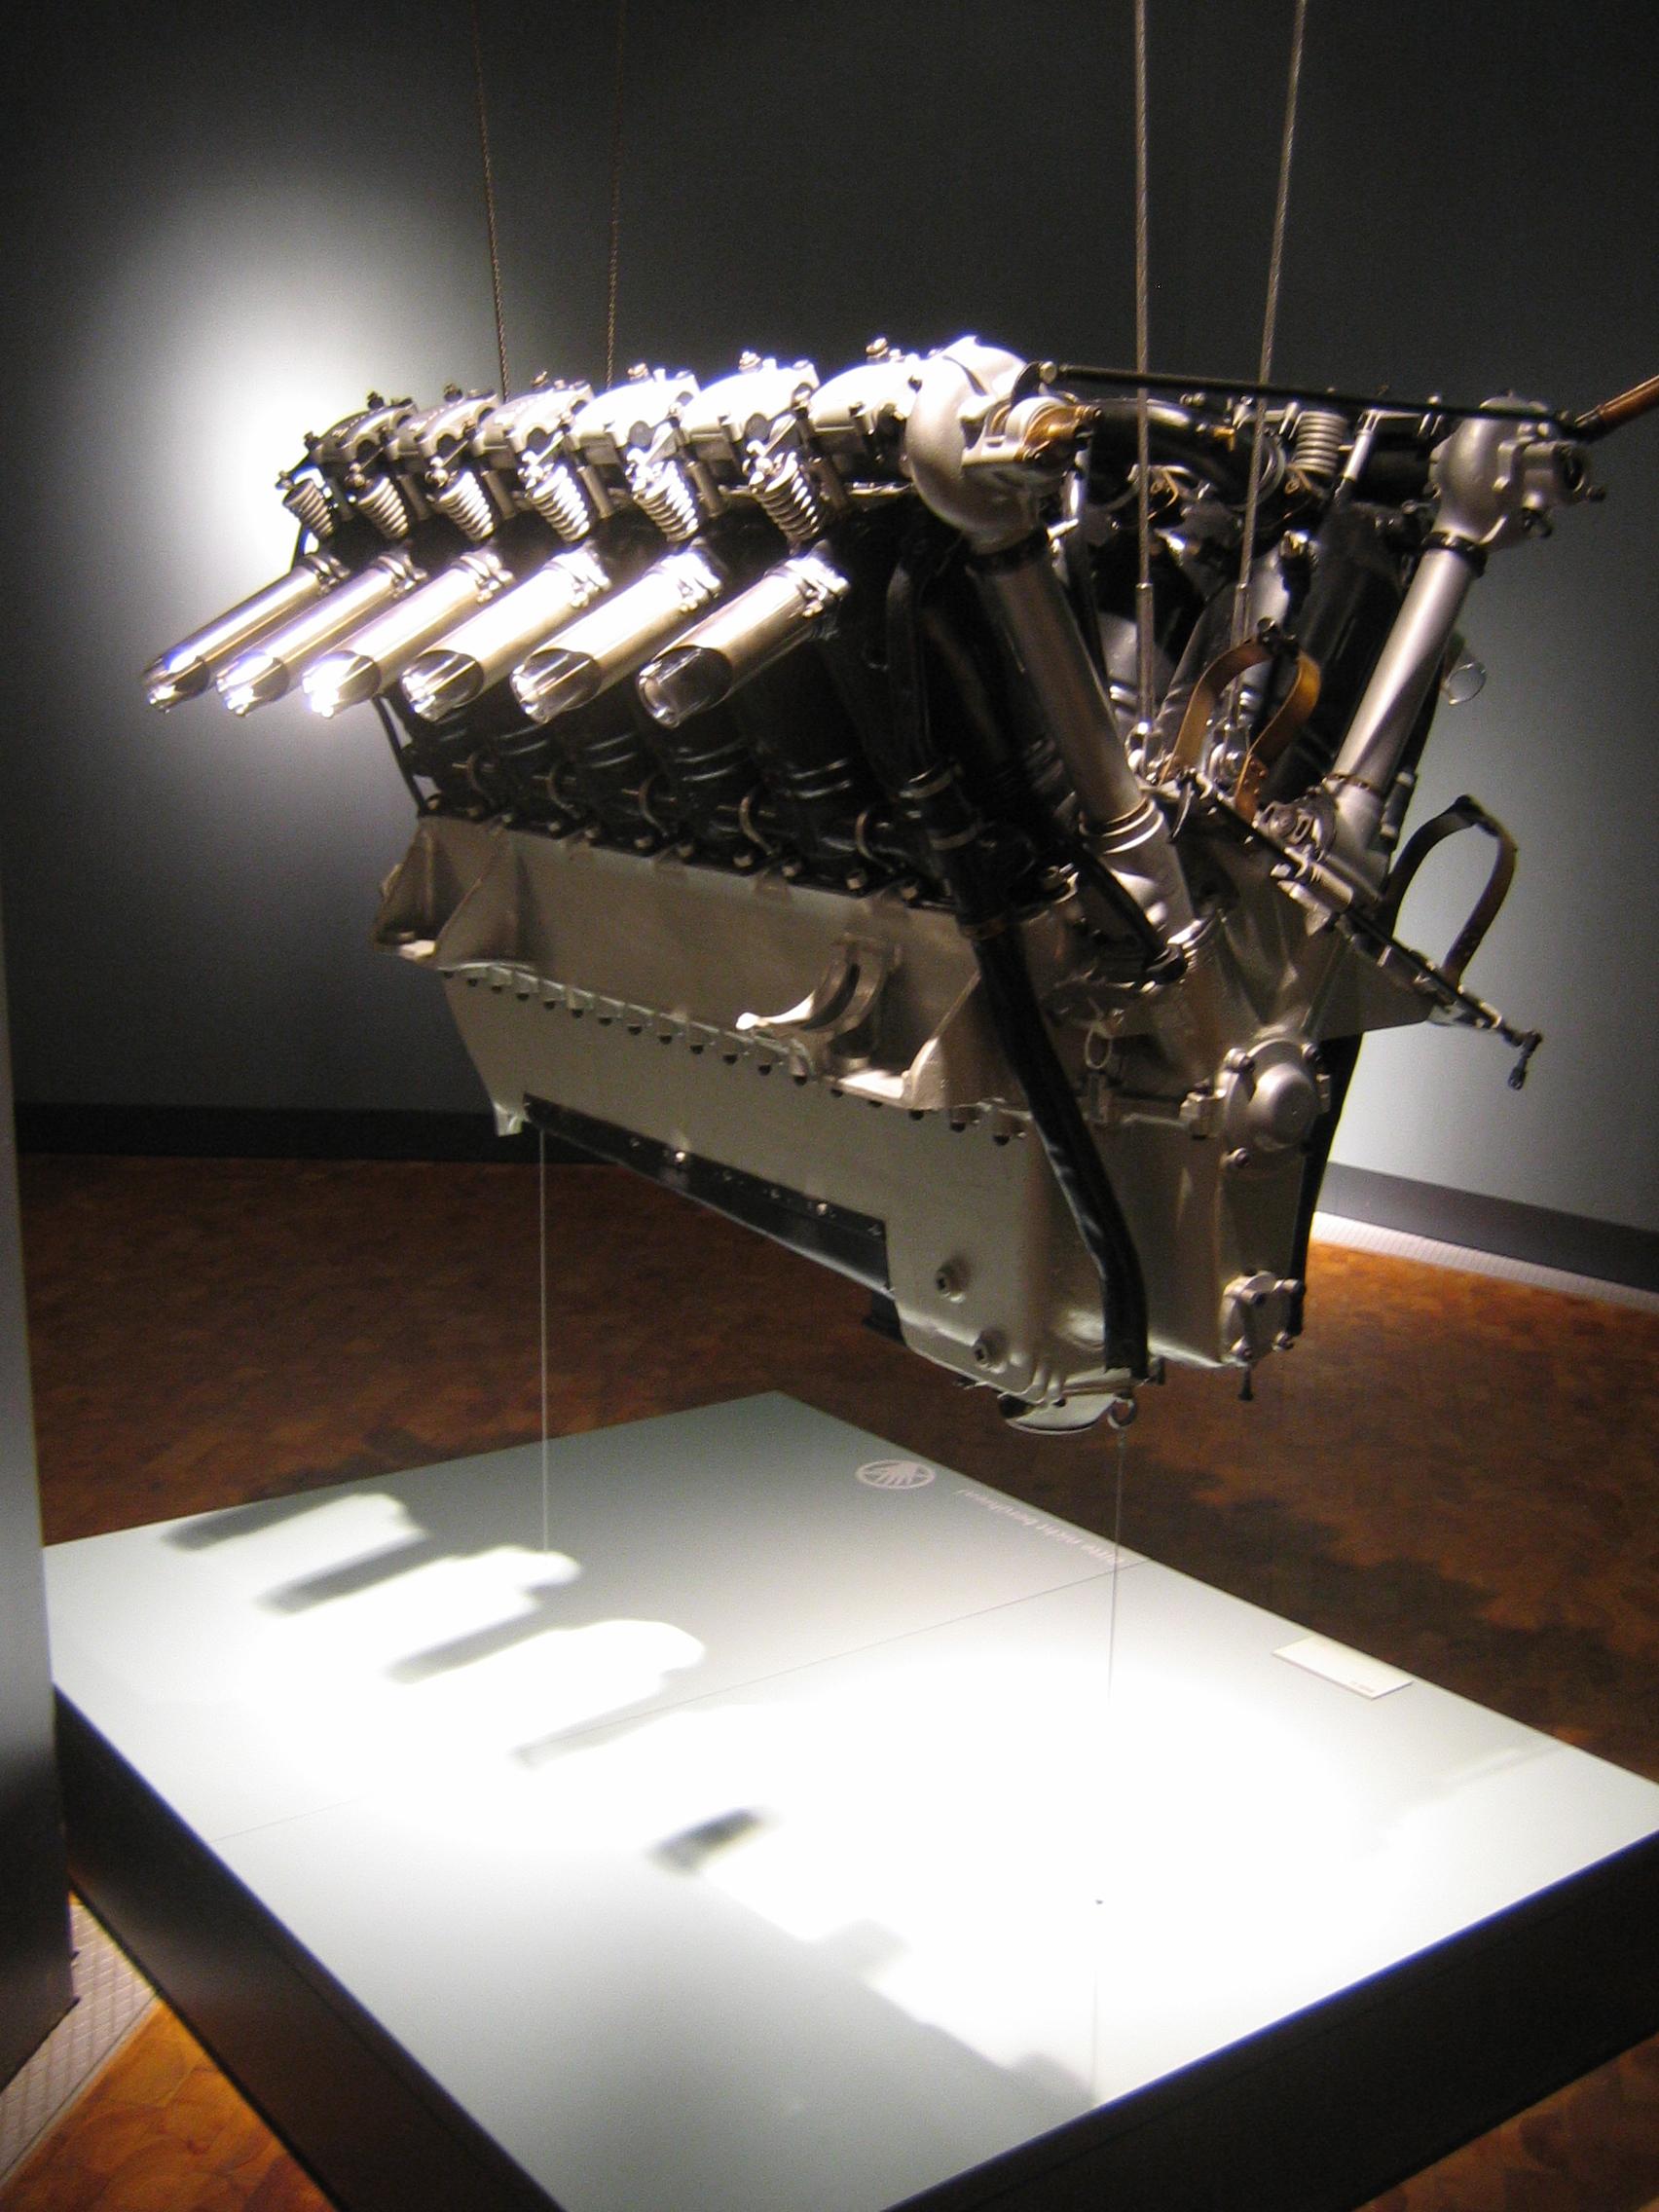 V12 engine - Wikipedia